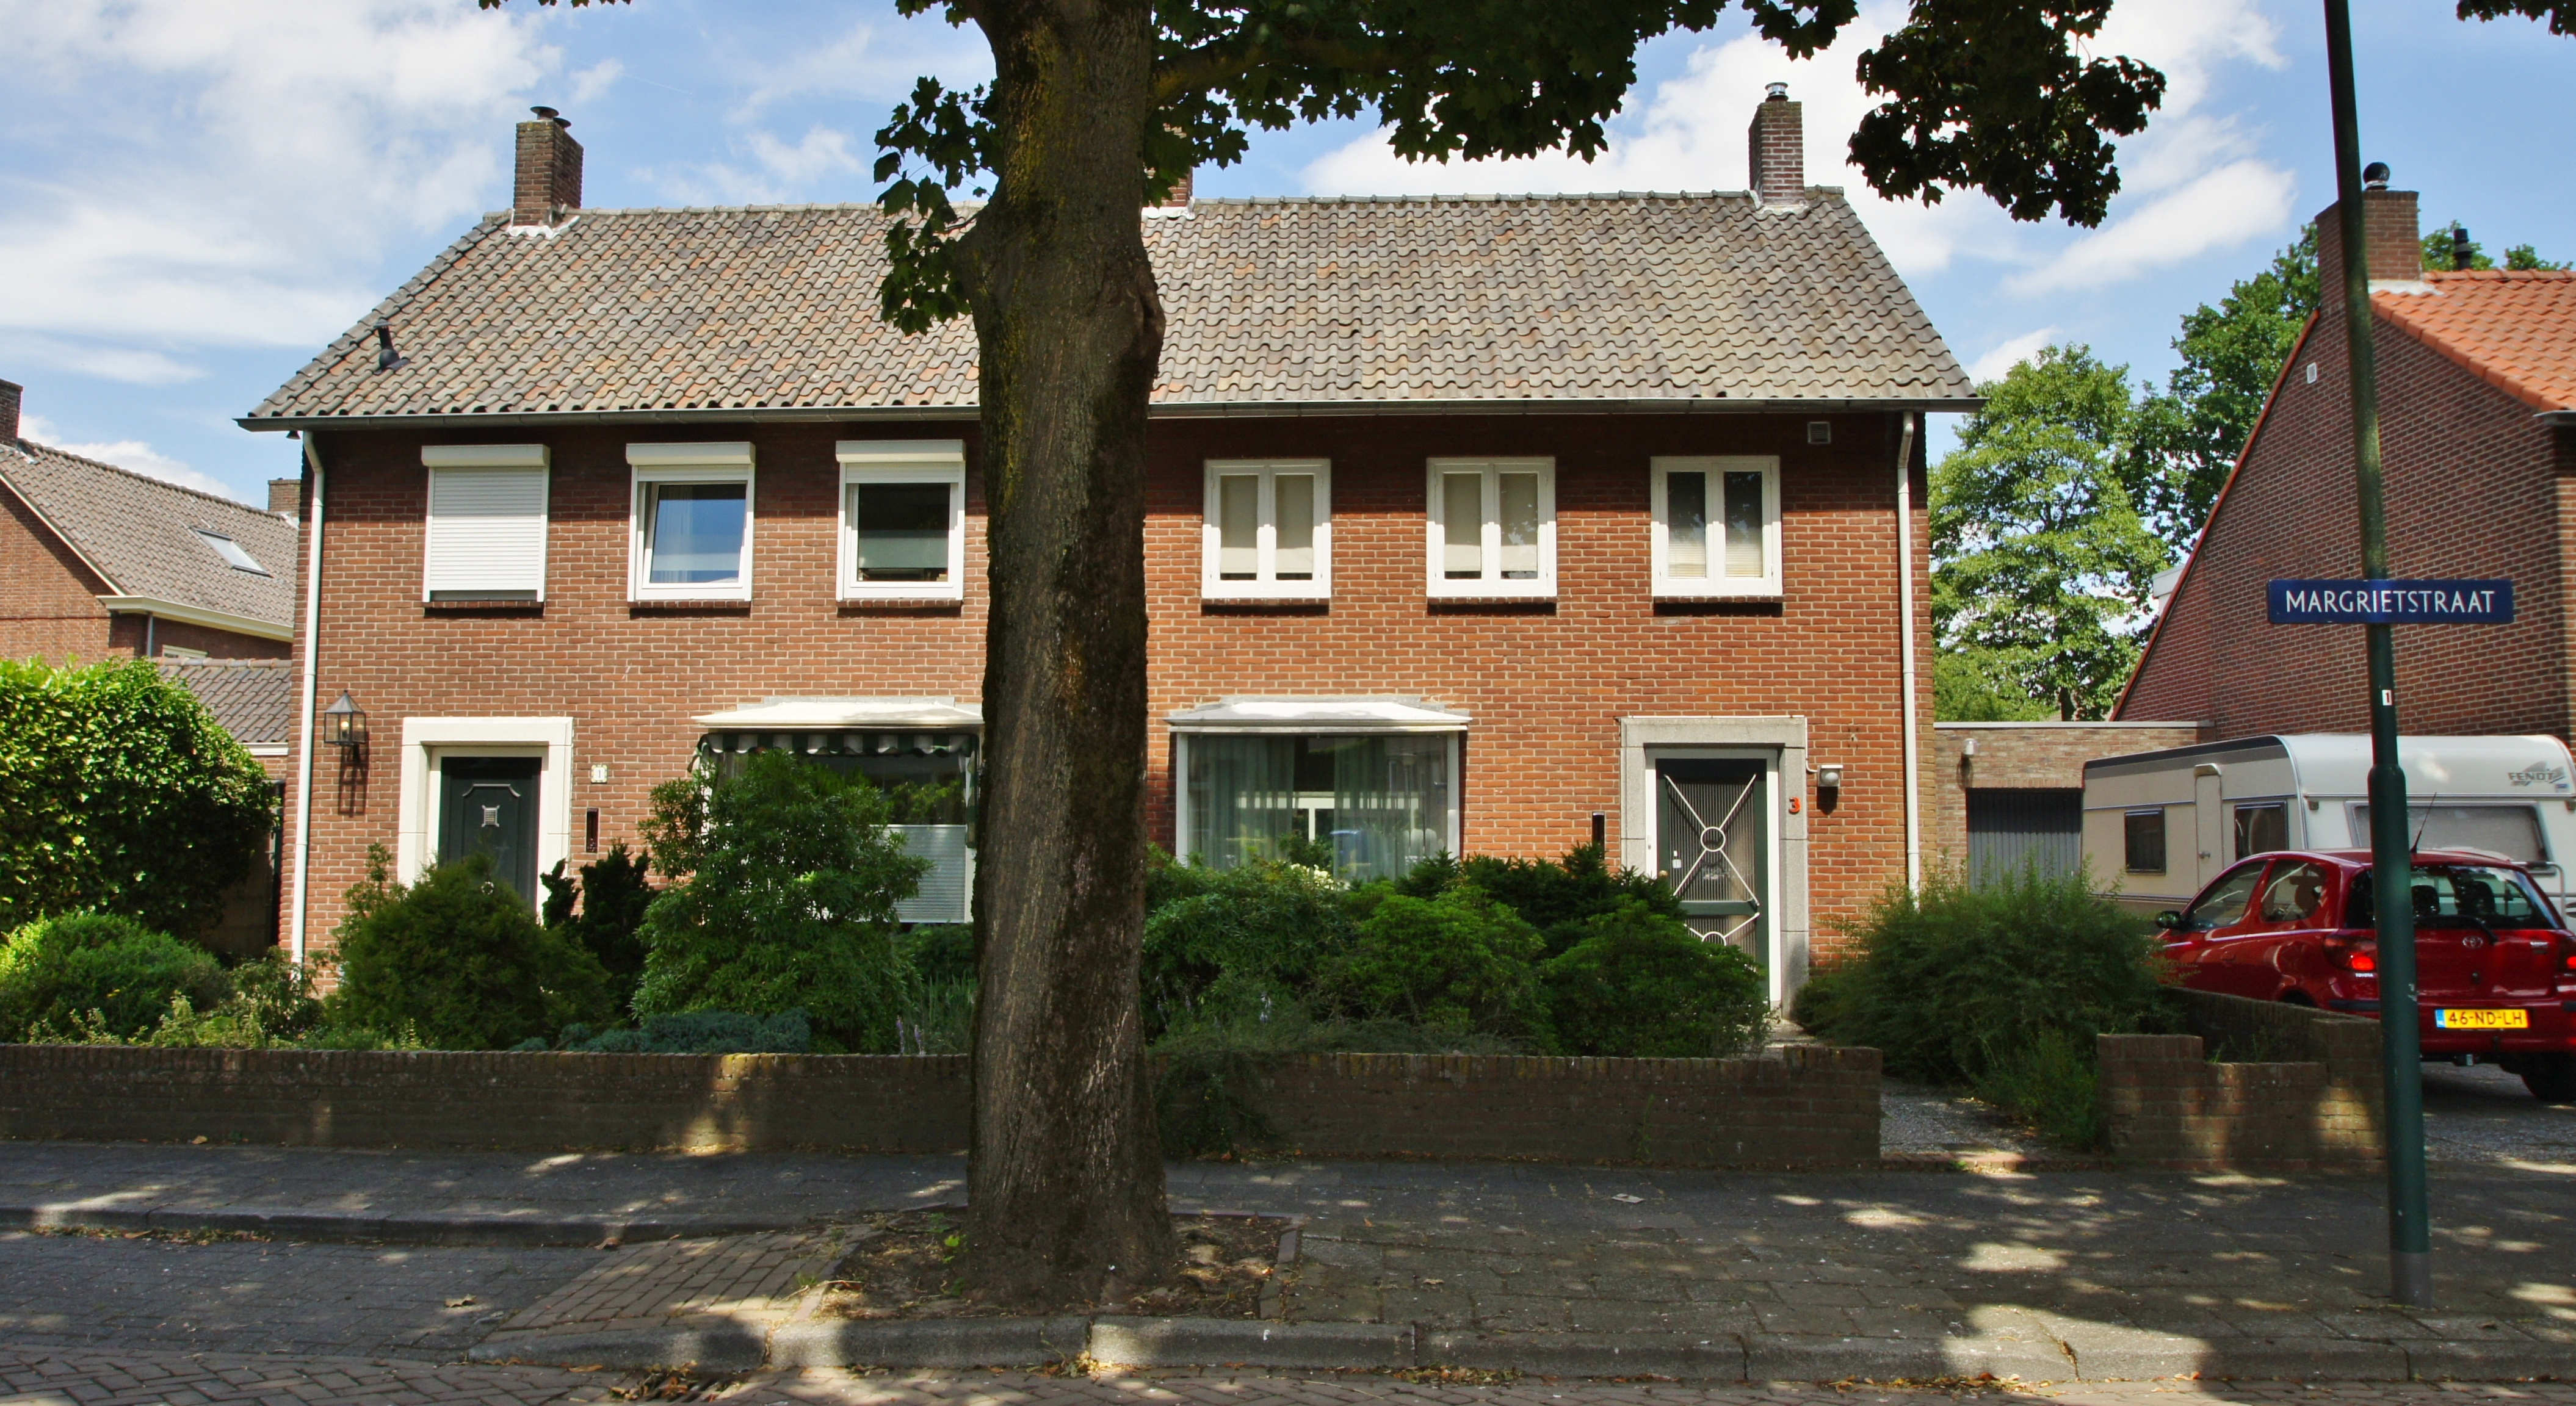 Property photo - Margrietstraat 3, 5121 XL Rijen